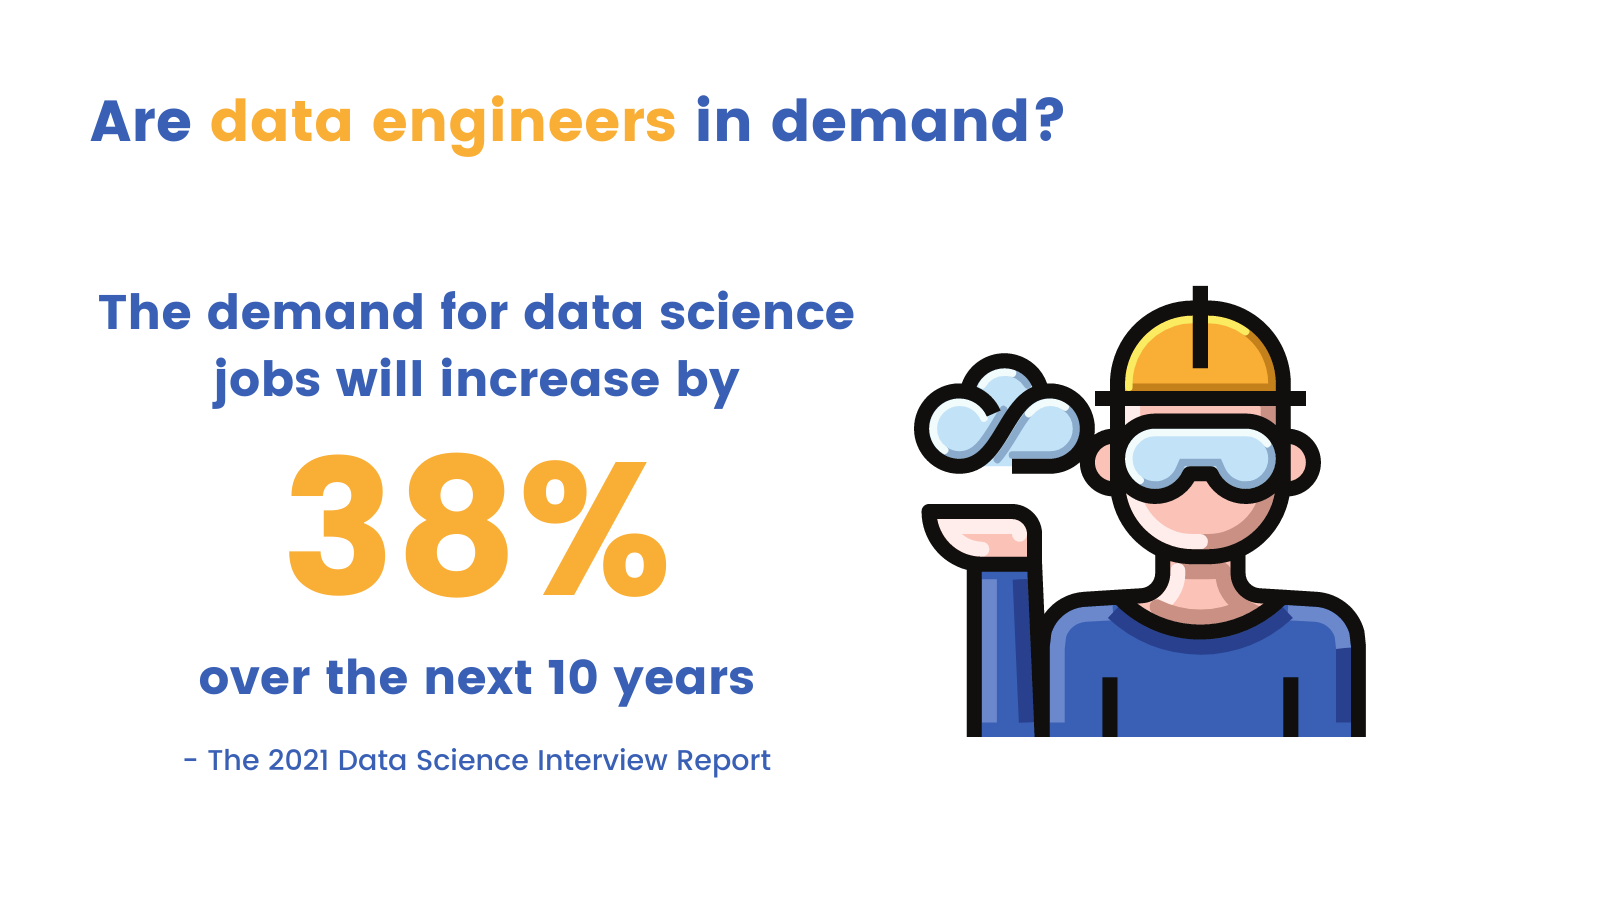 data engineers